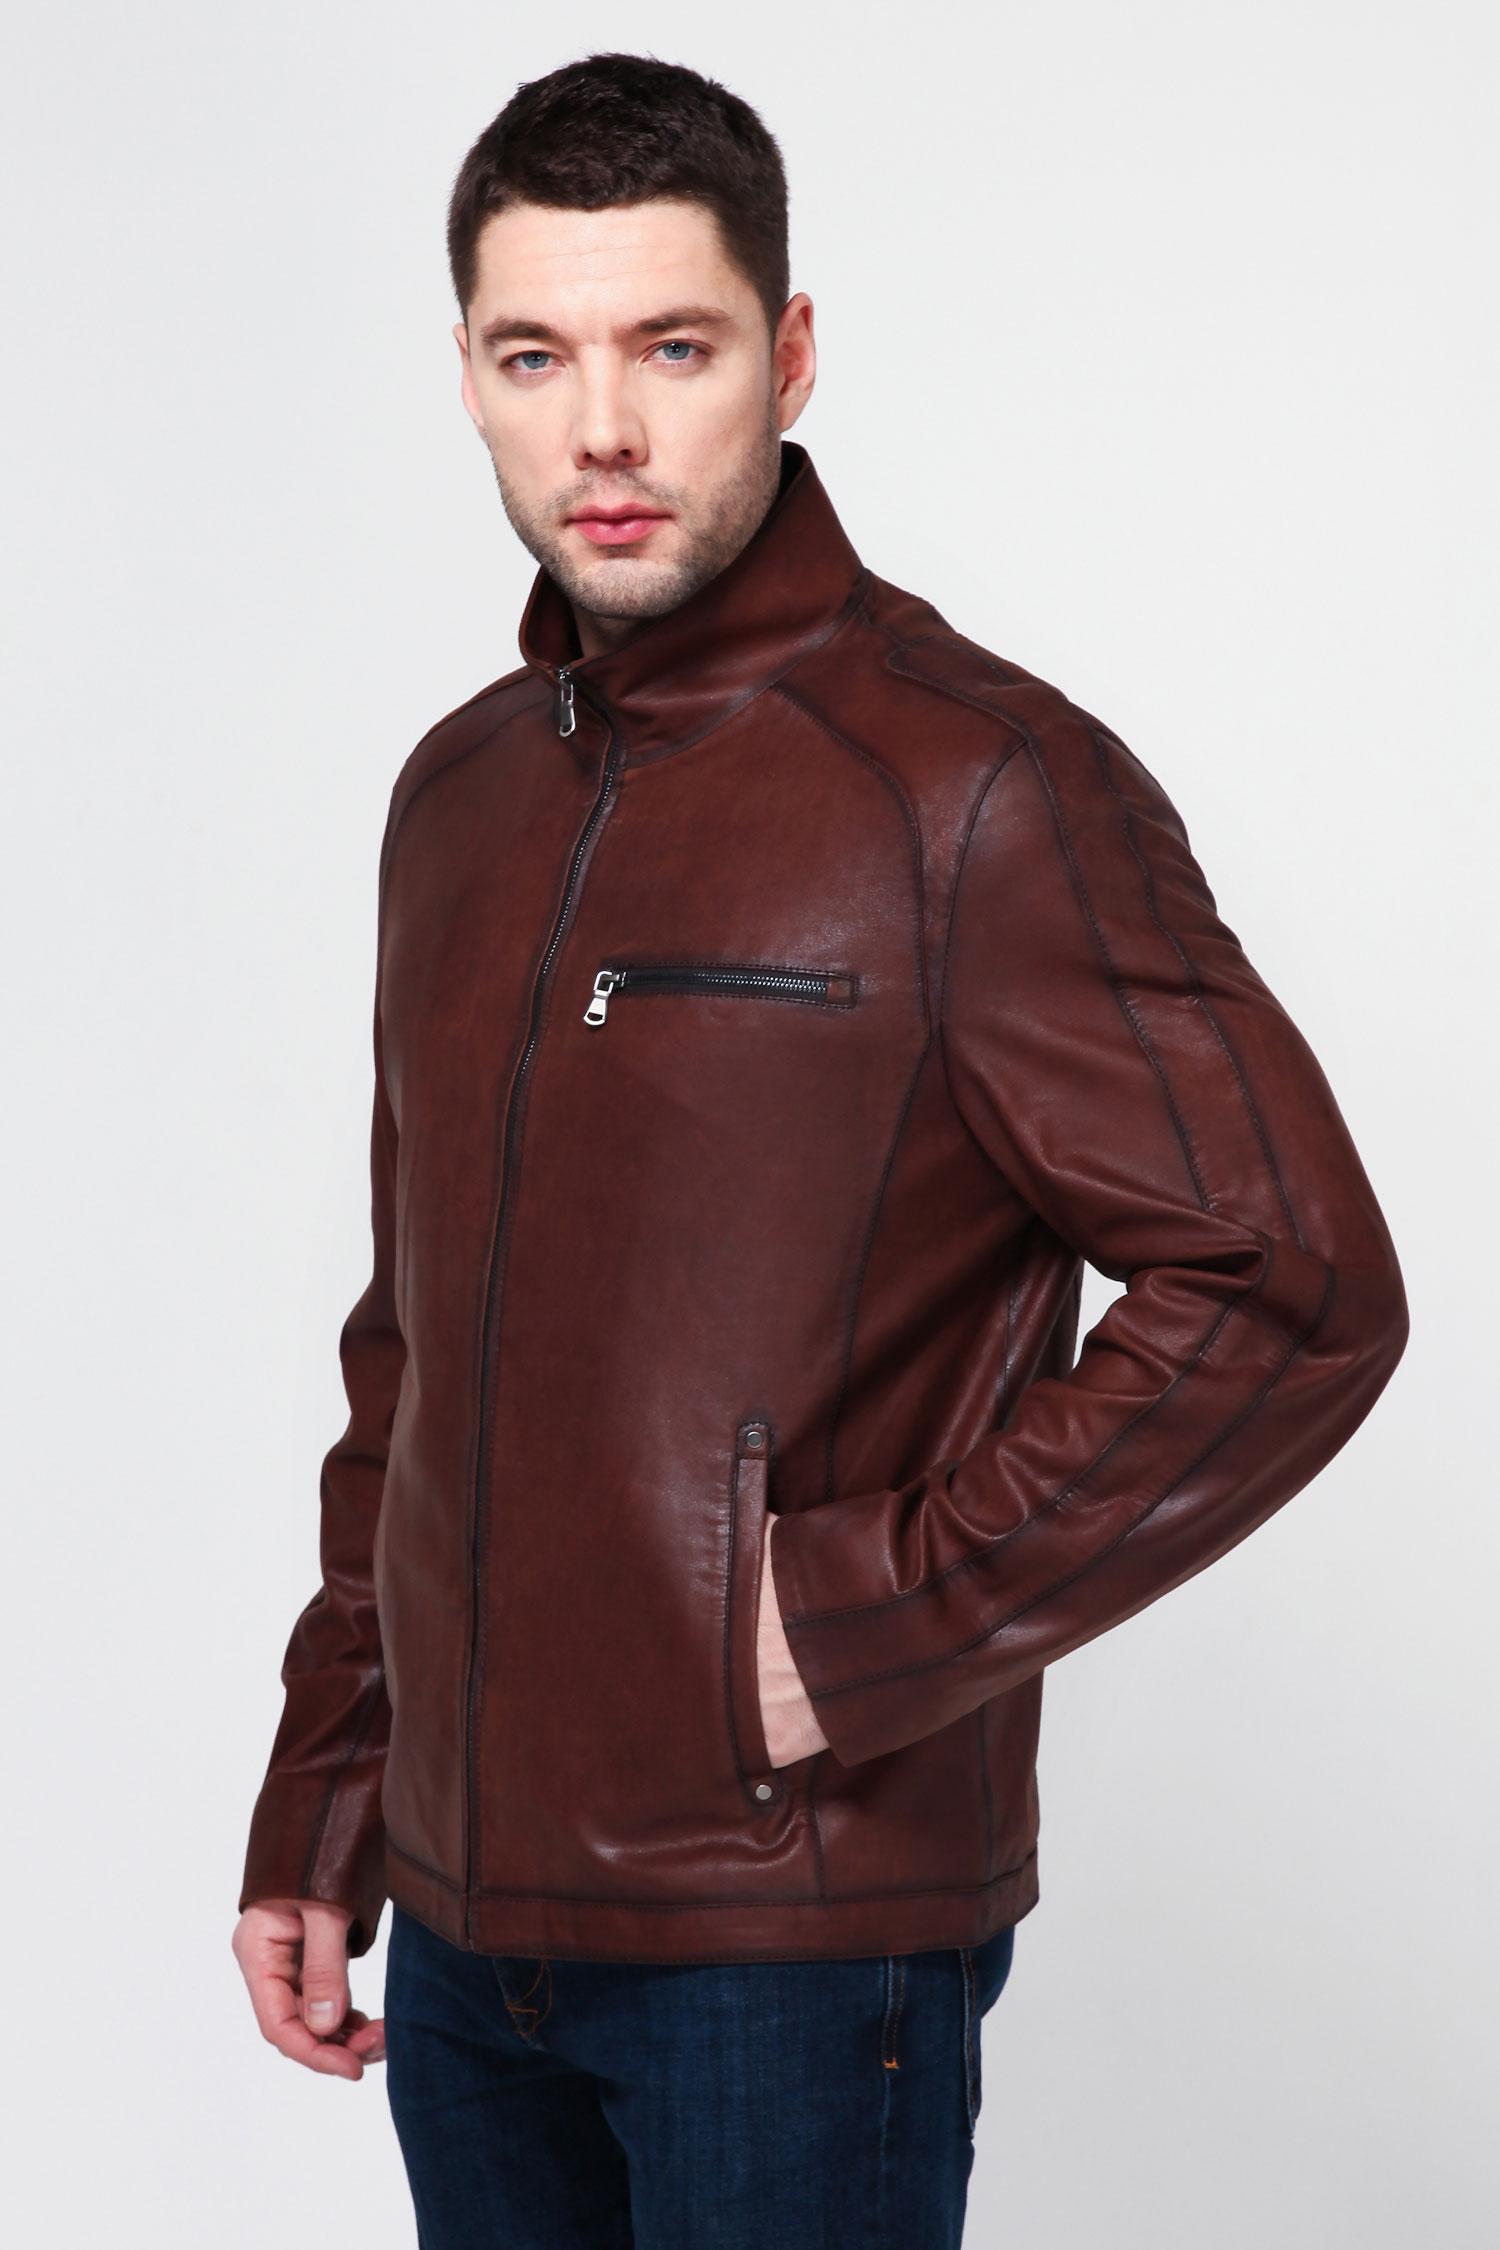 Купить куртку в ве Самарав